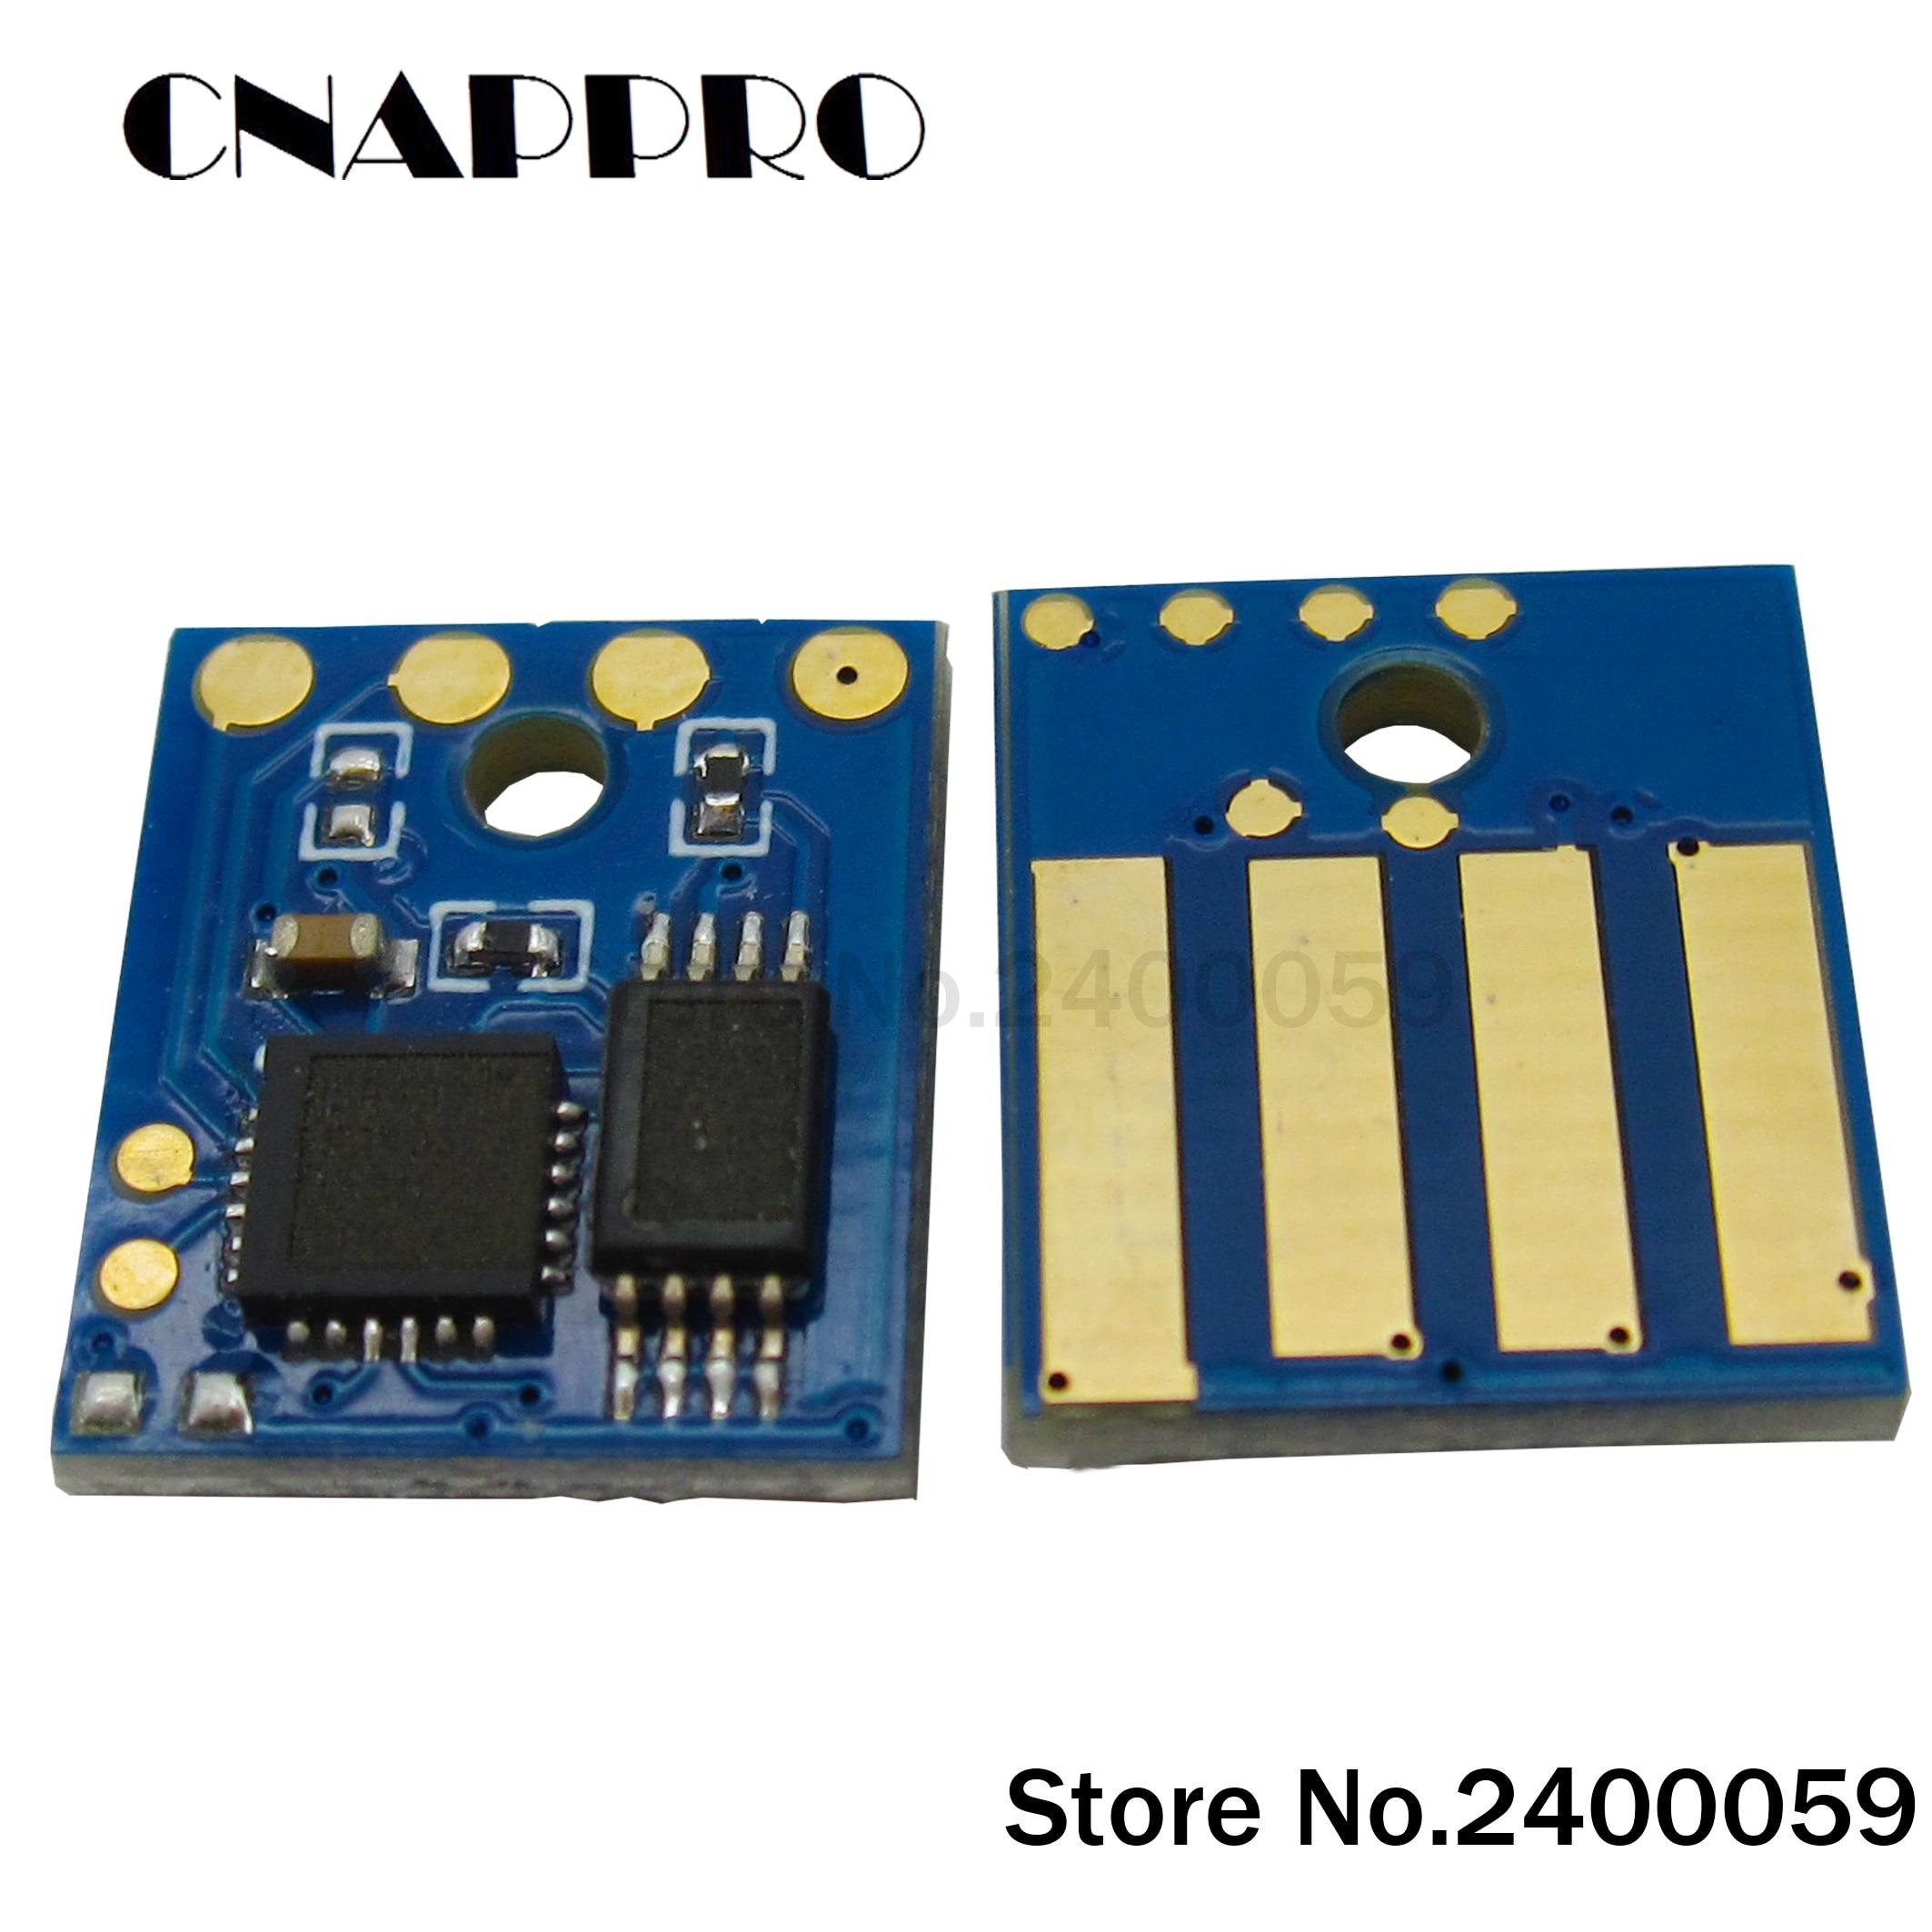 1 個 10 18K MS310 MX310 レックスマーク MS310dn MS410d MS410dn MS510dn MX410dn MX511dte MX611de MX610d カートリッジリセット